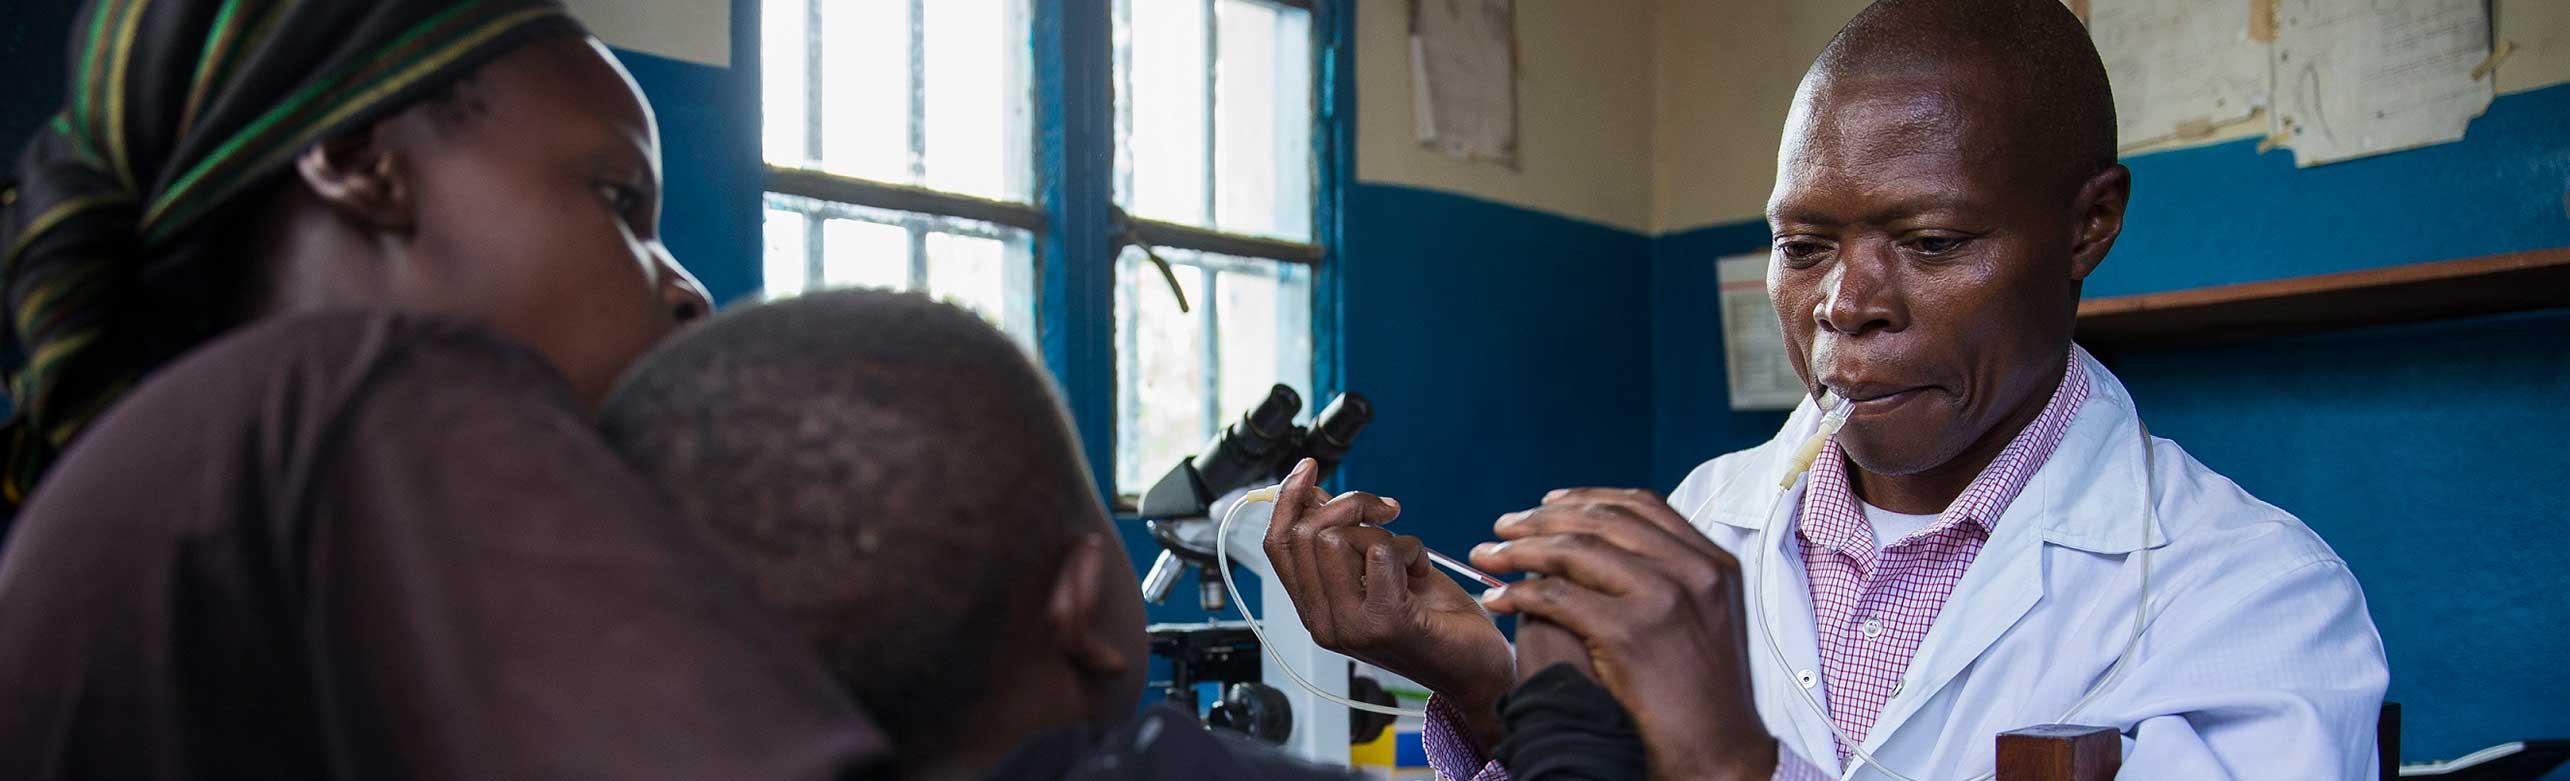 Gezondheidszorg Congo